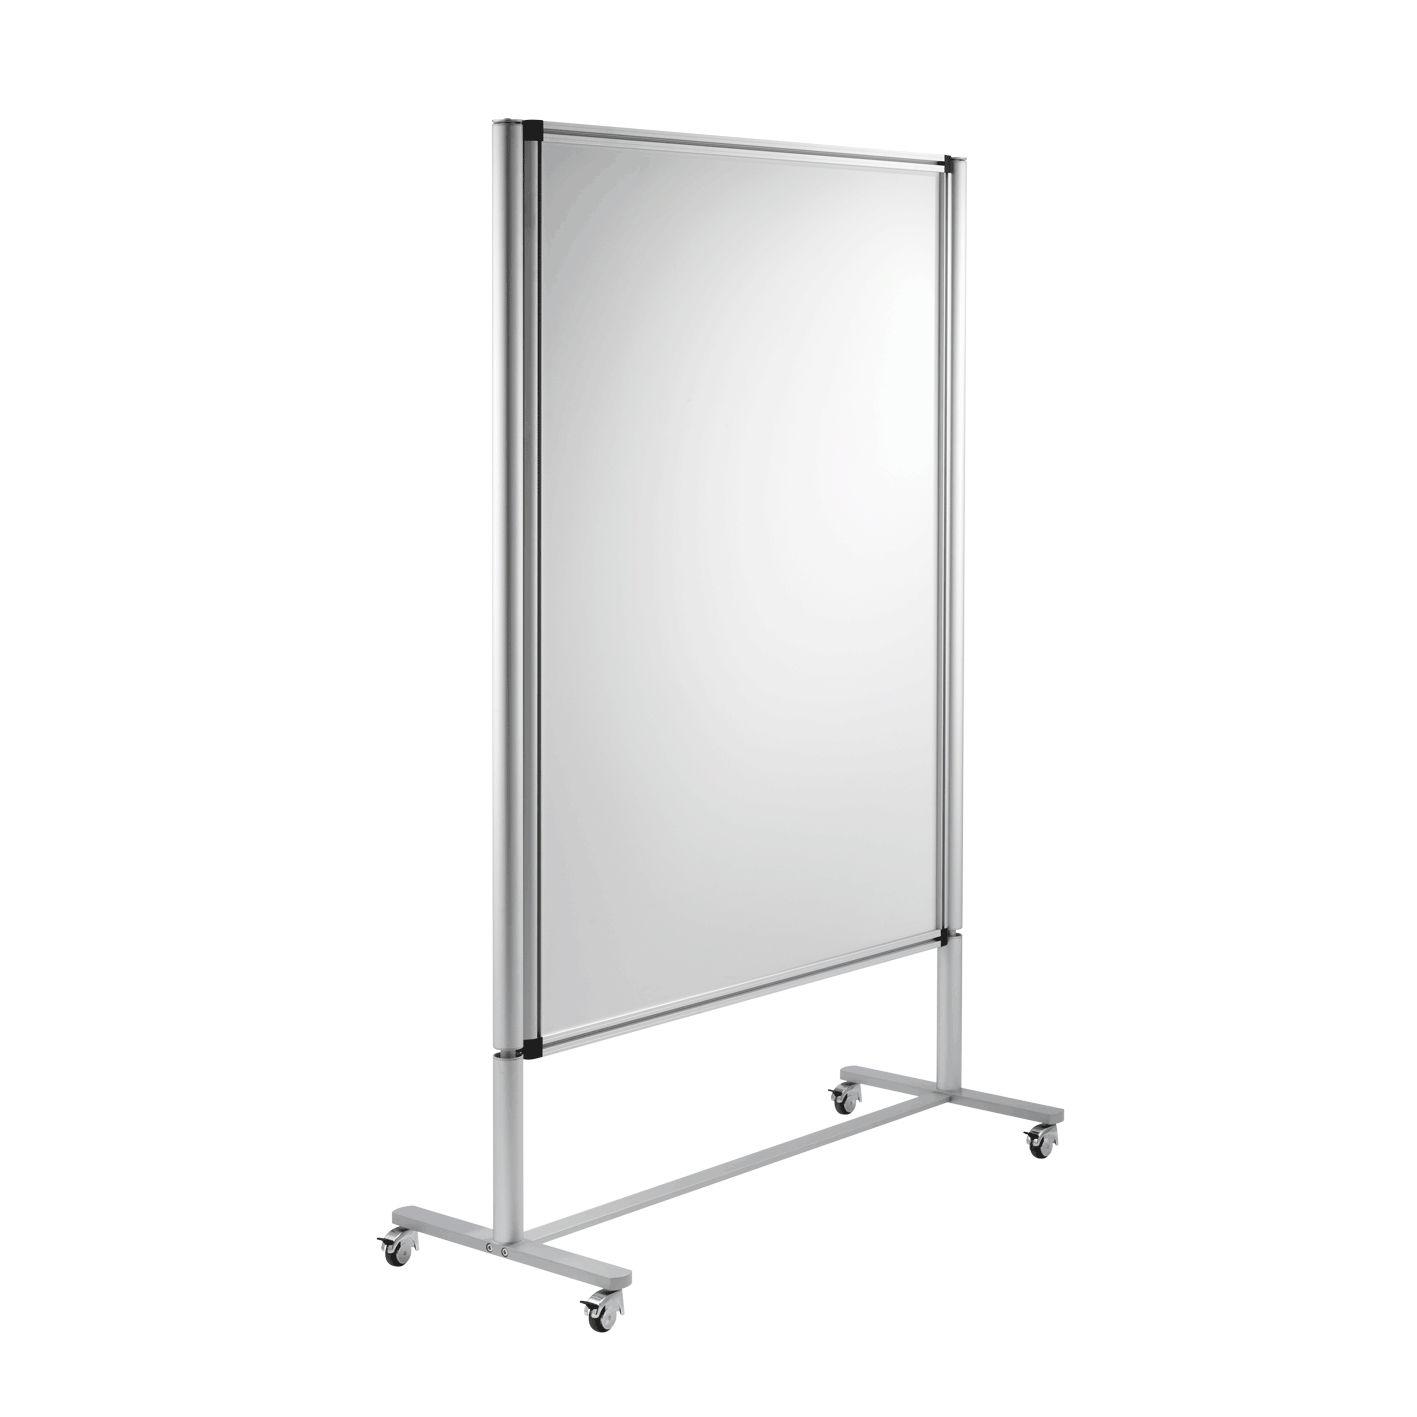 Transportierbare Trennwand / Metall / Glas / Drahtgeflecht ...